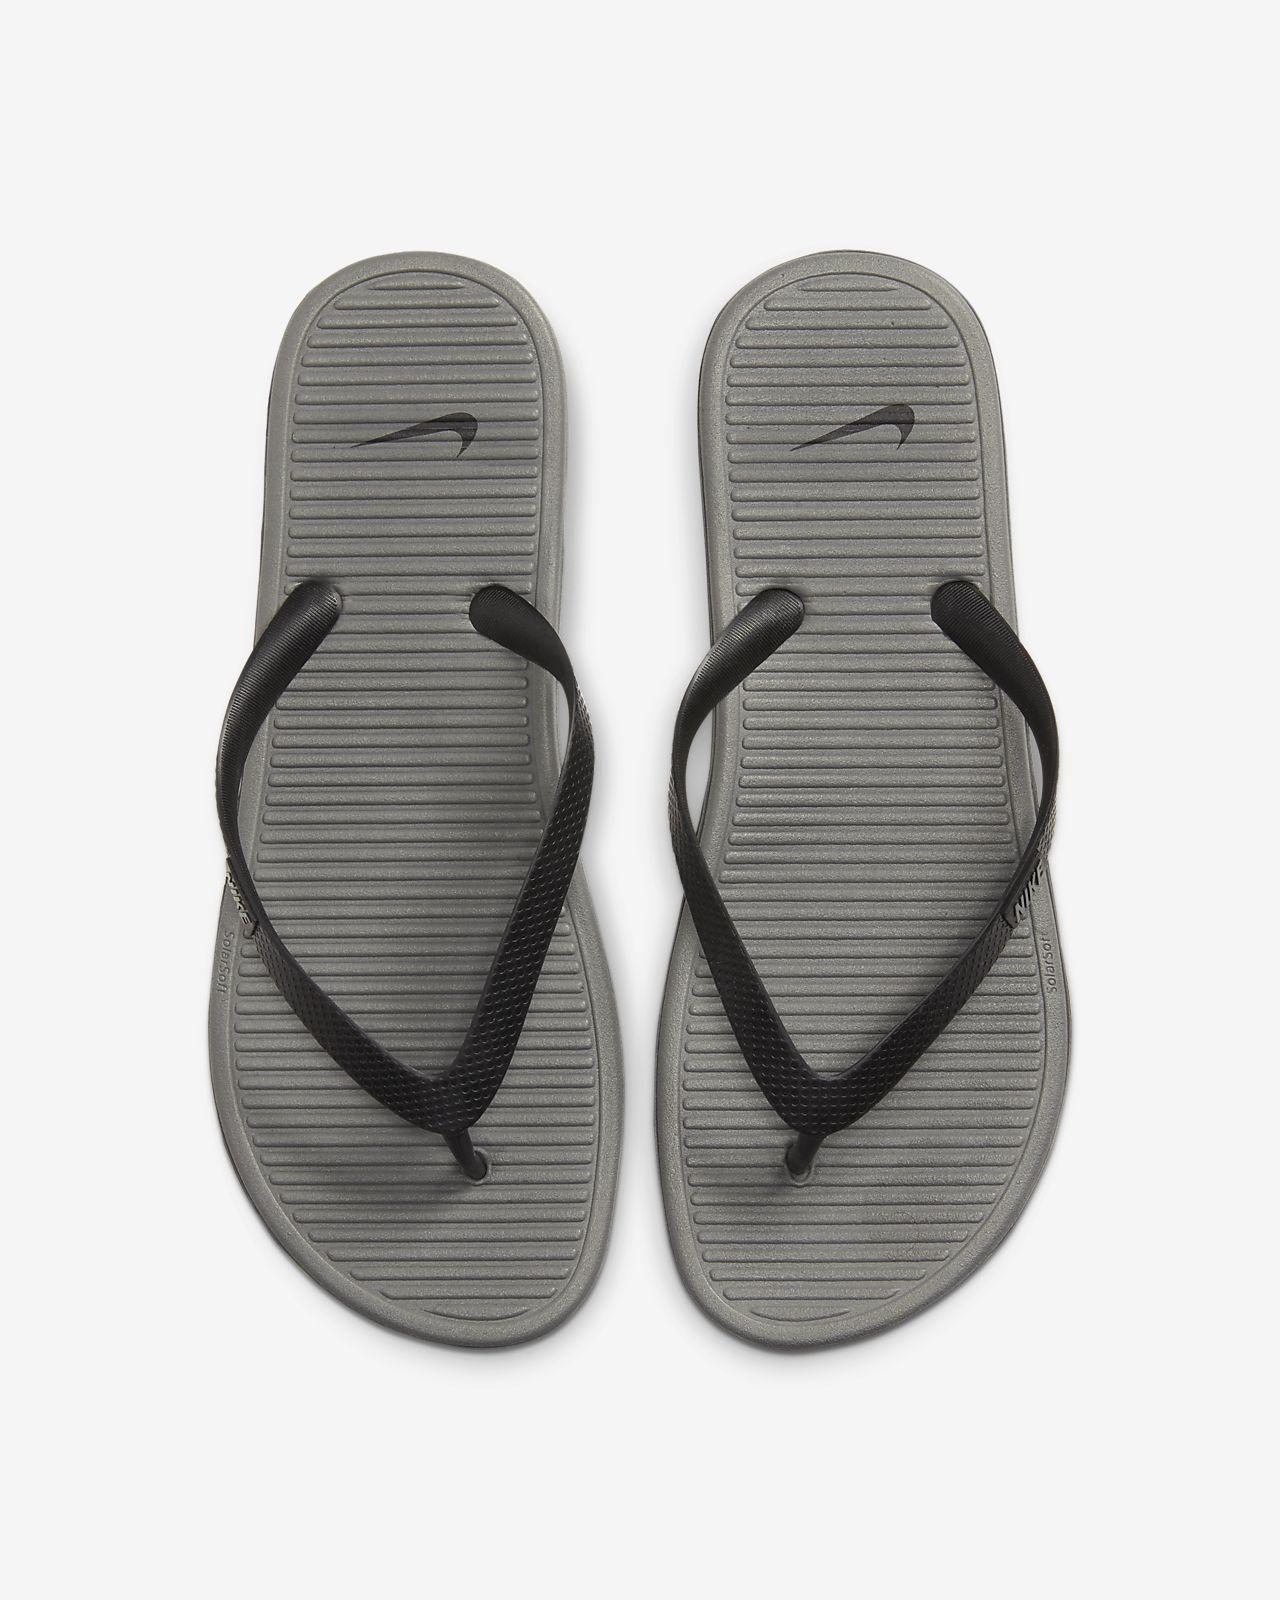 Chanclas para hombre Nike Solarsoft II